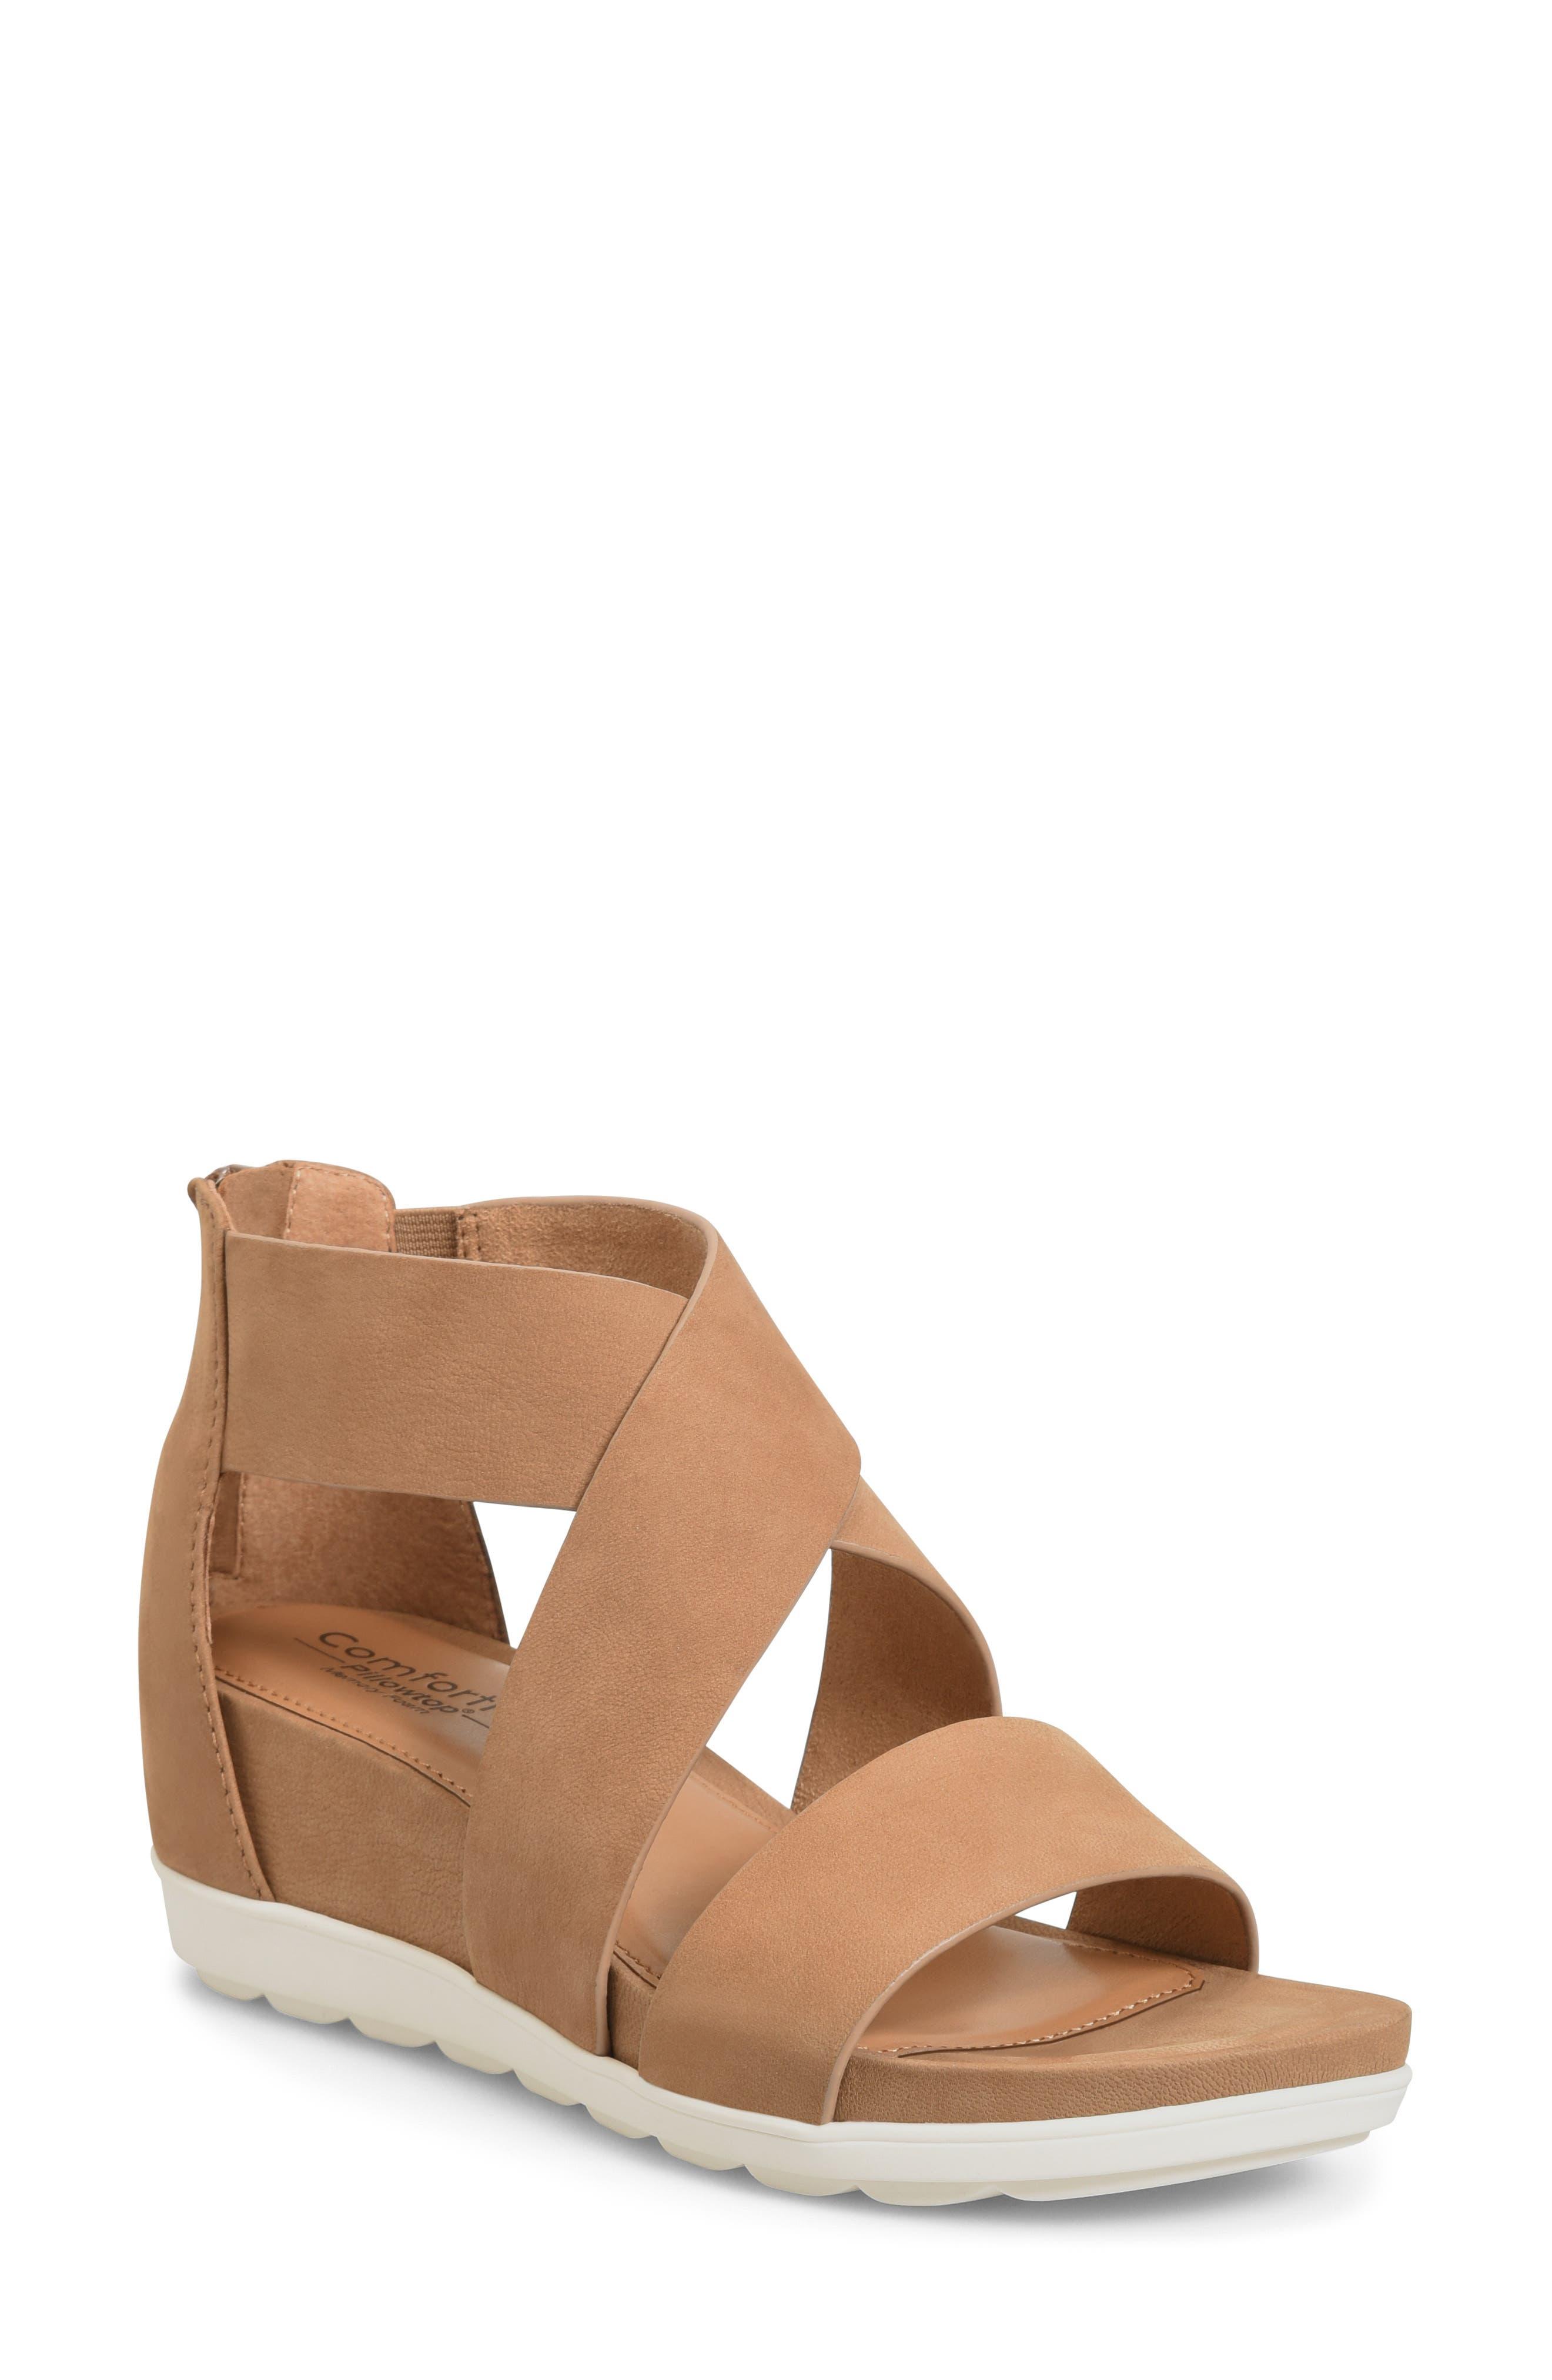 Pacifica Strappy Sandal